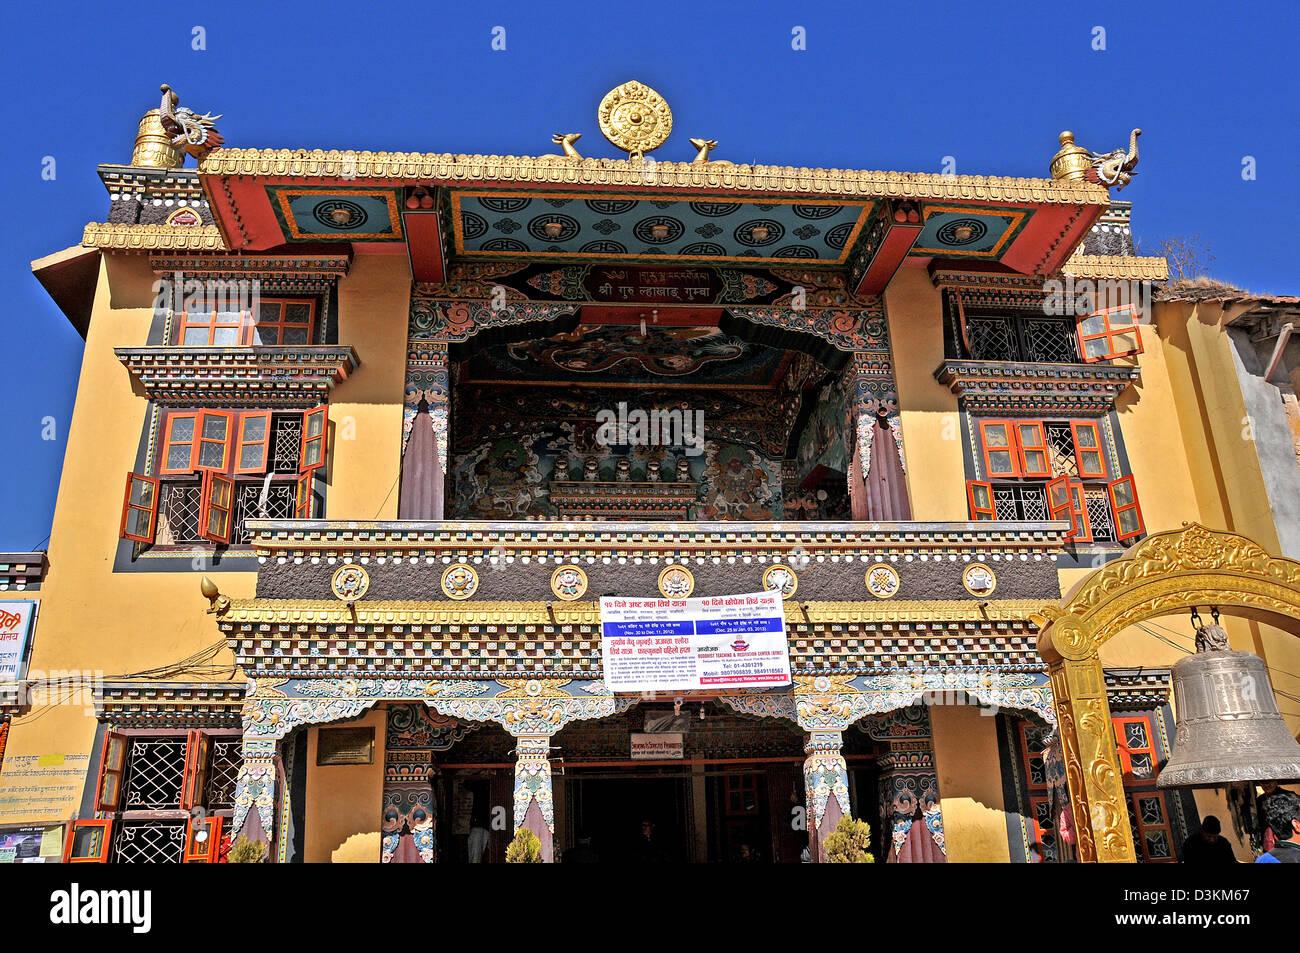 Budhhist teaching and meditation center Bodhnath Nepal - Stock Image